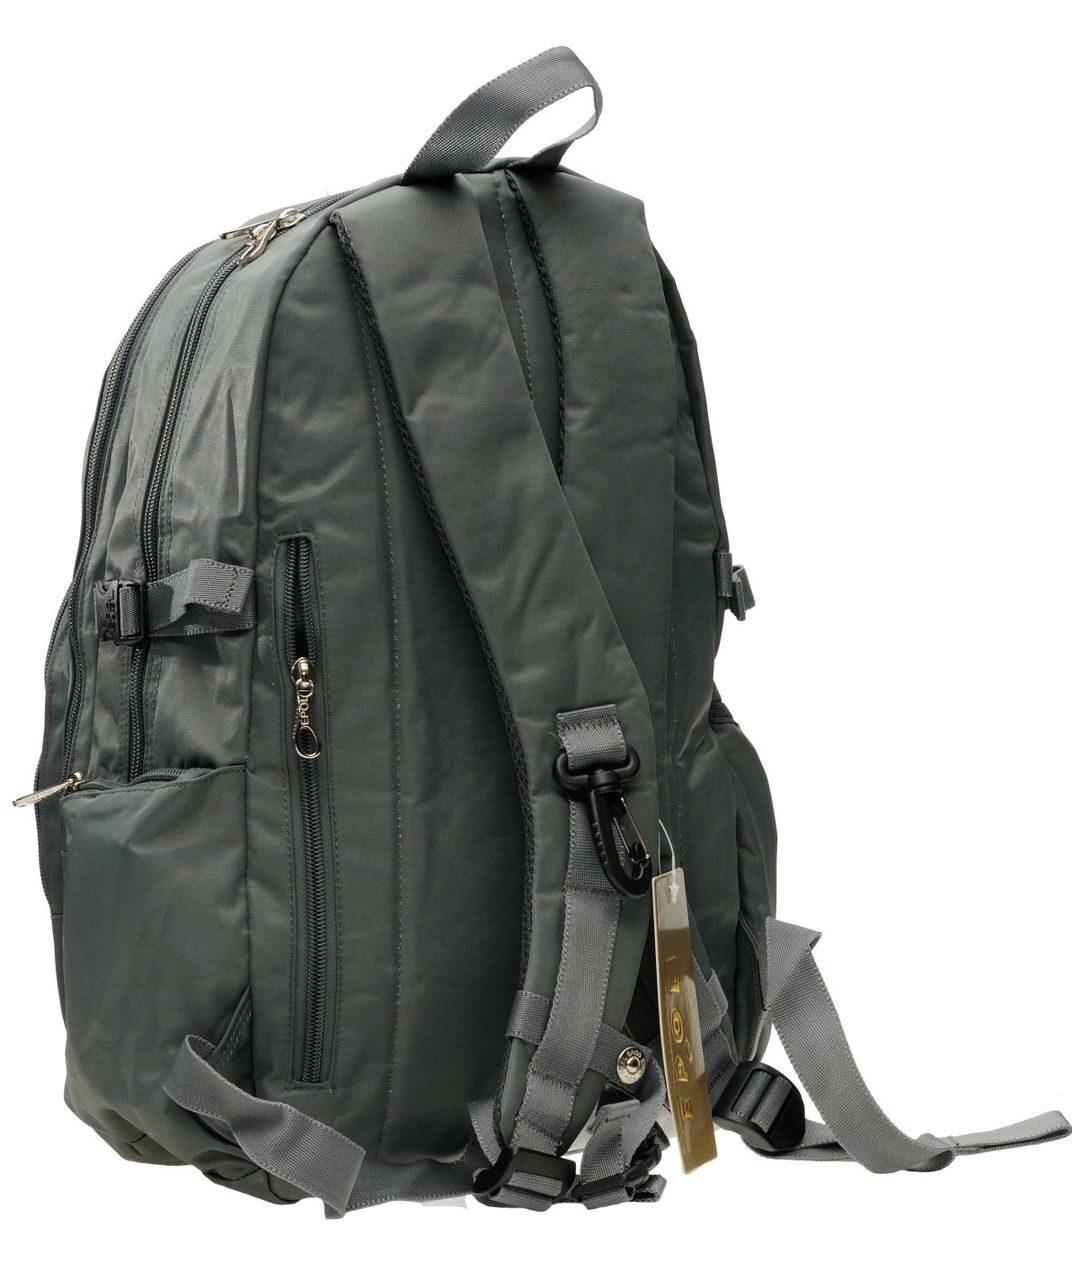 Рюкзаки epol bags лучшие рюкзаки г златоуст